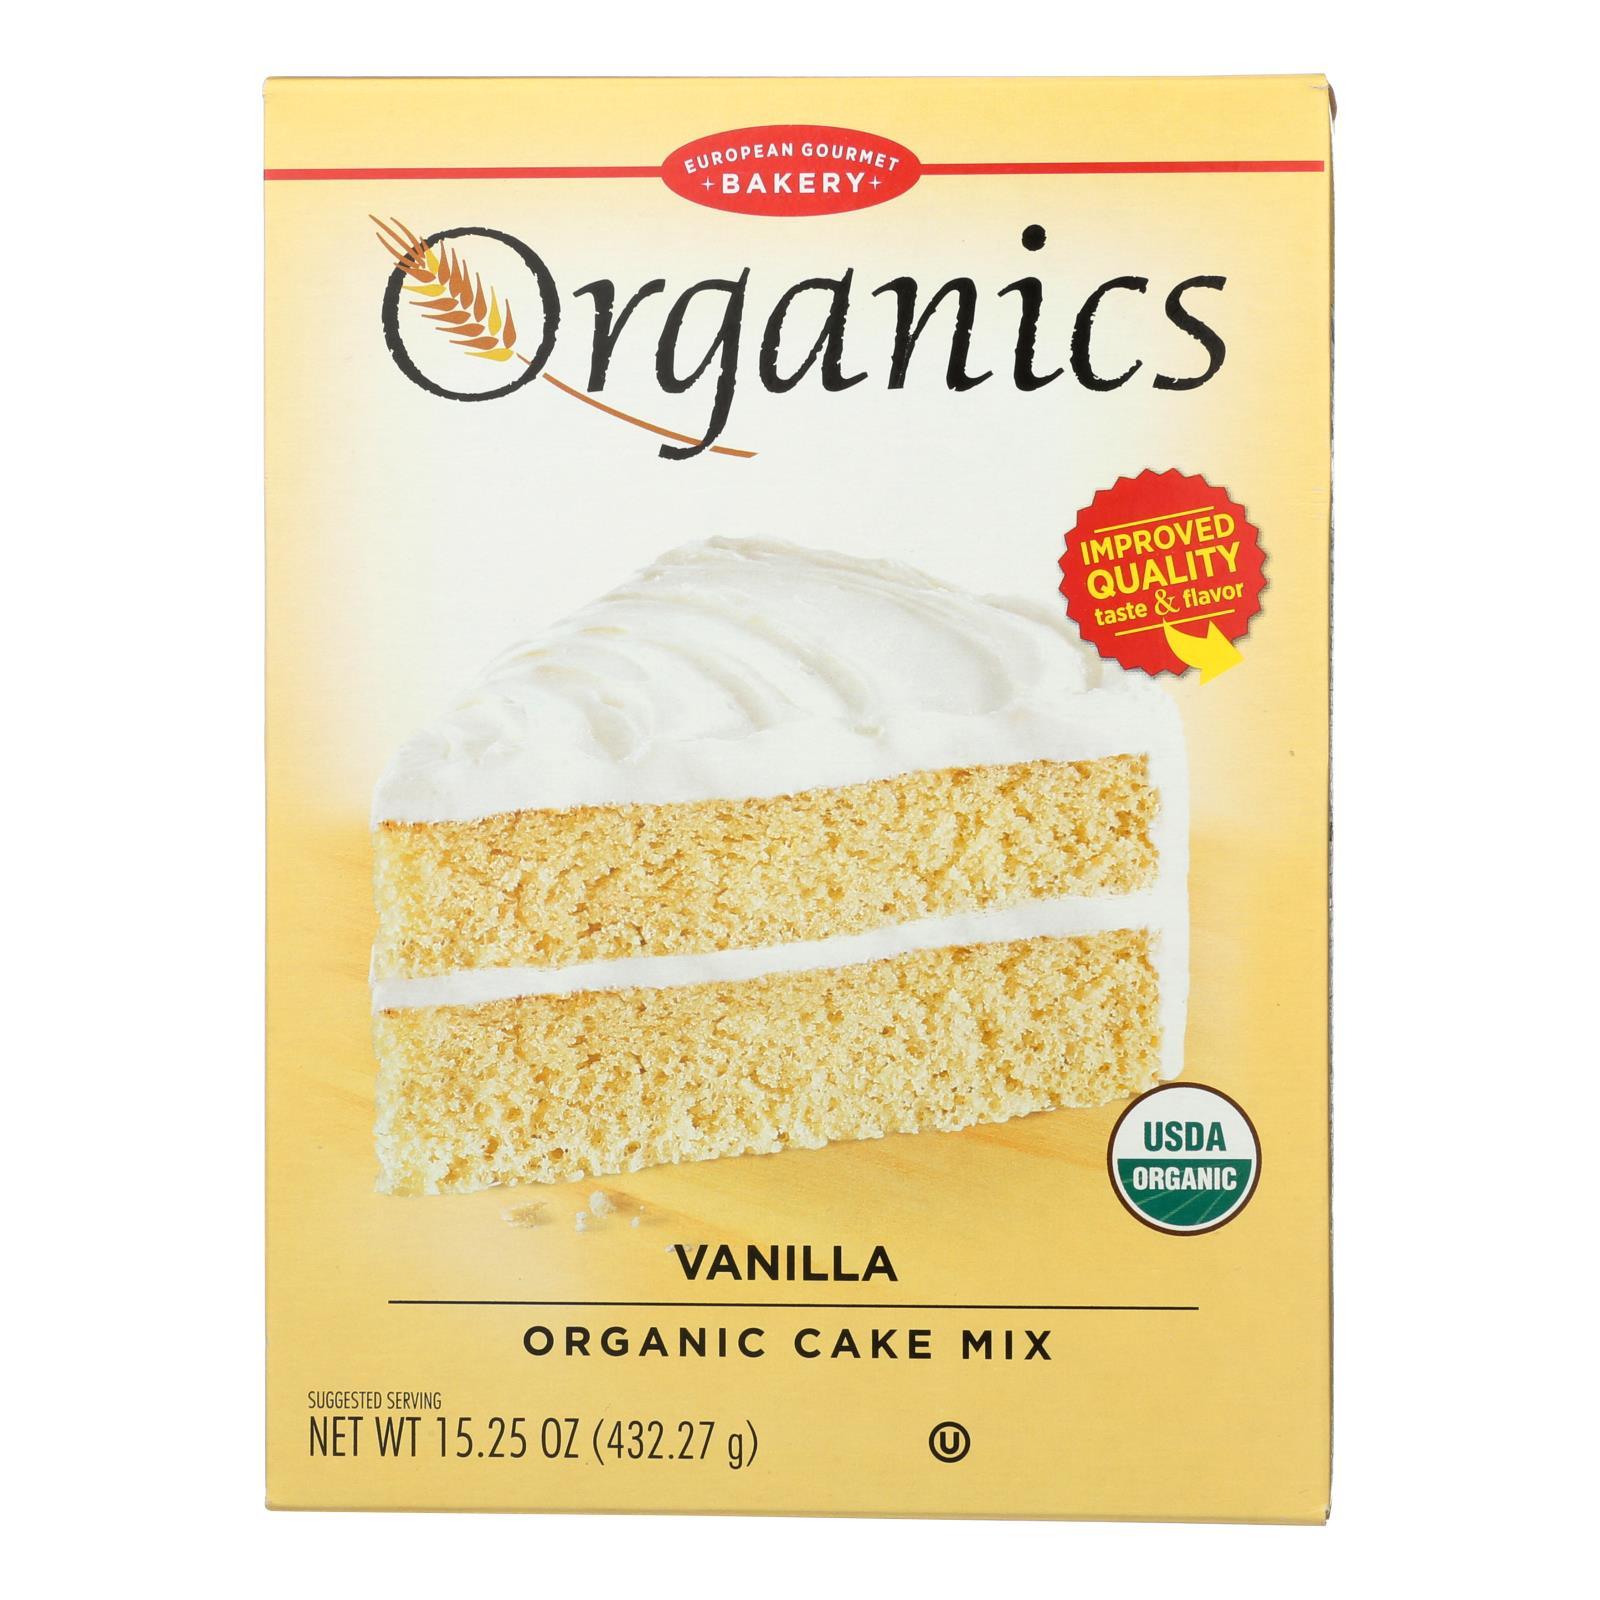 European Gourmet Bakery - Cake Mix Vanilla - Case of 6-15.25 OZ